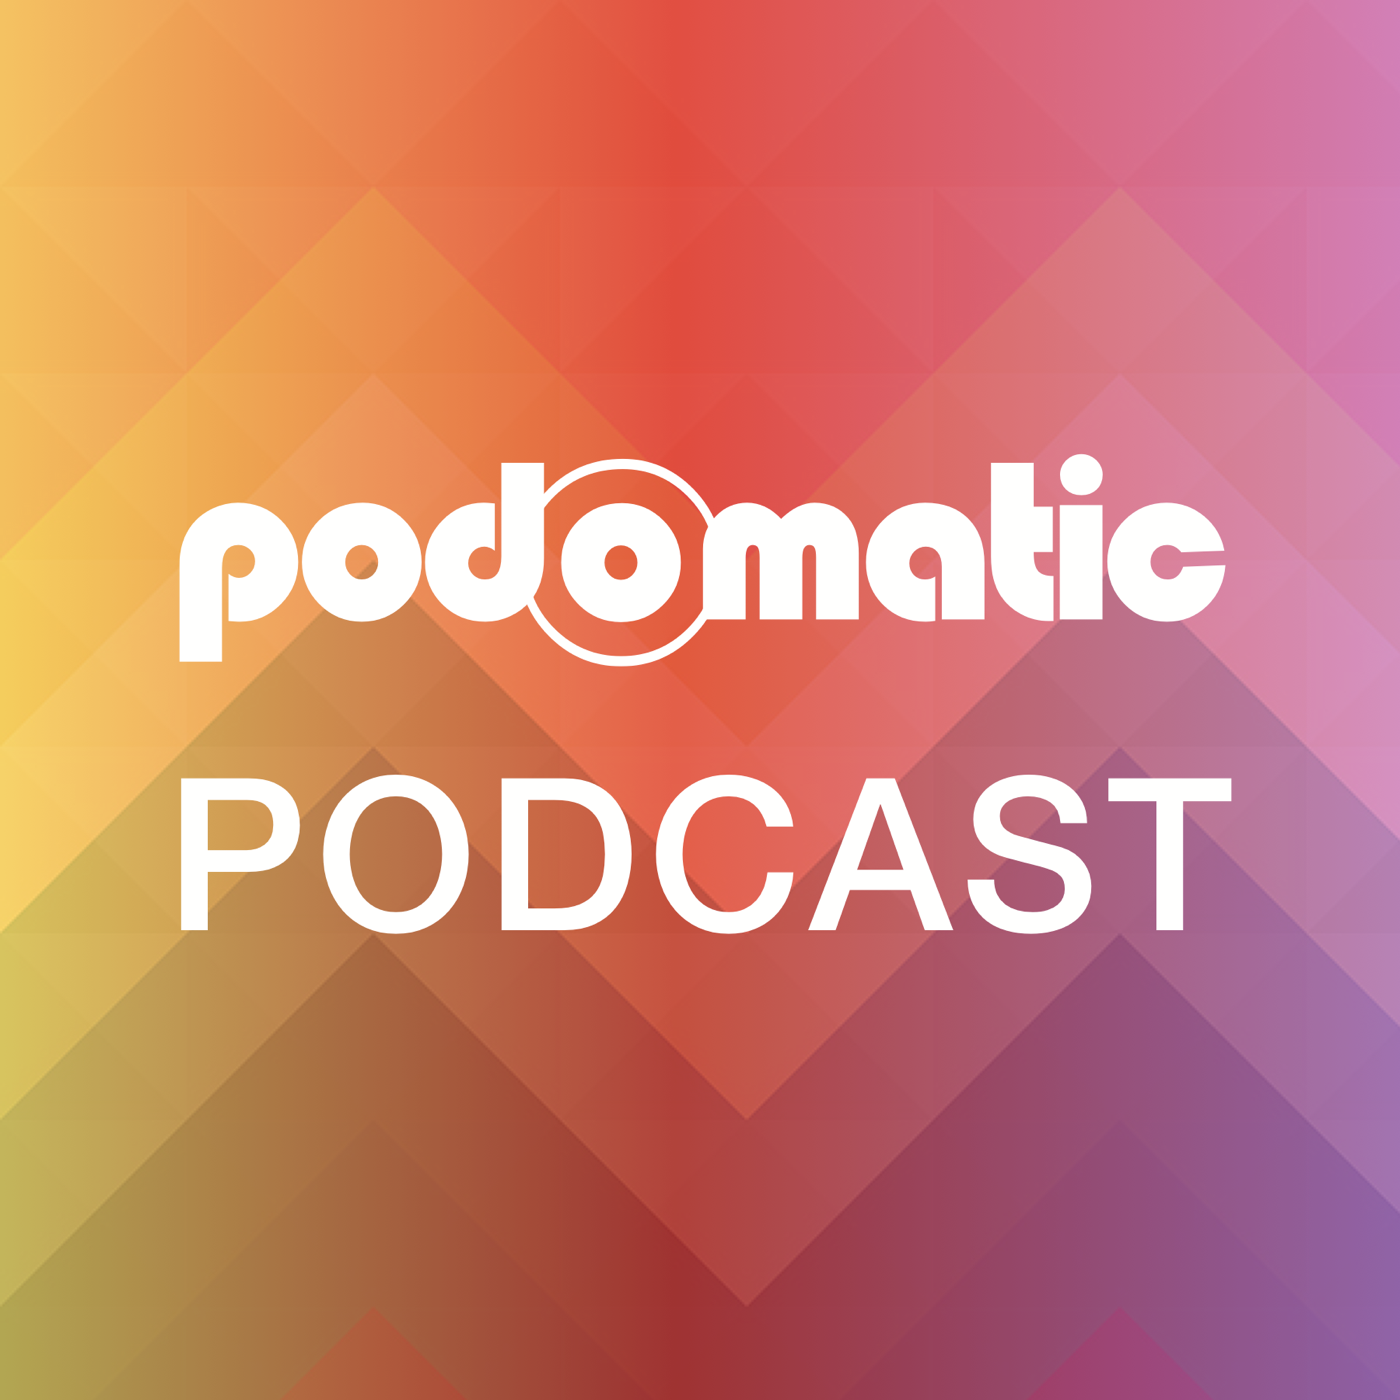 Patrick Beachem's Podcast